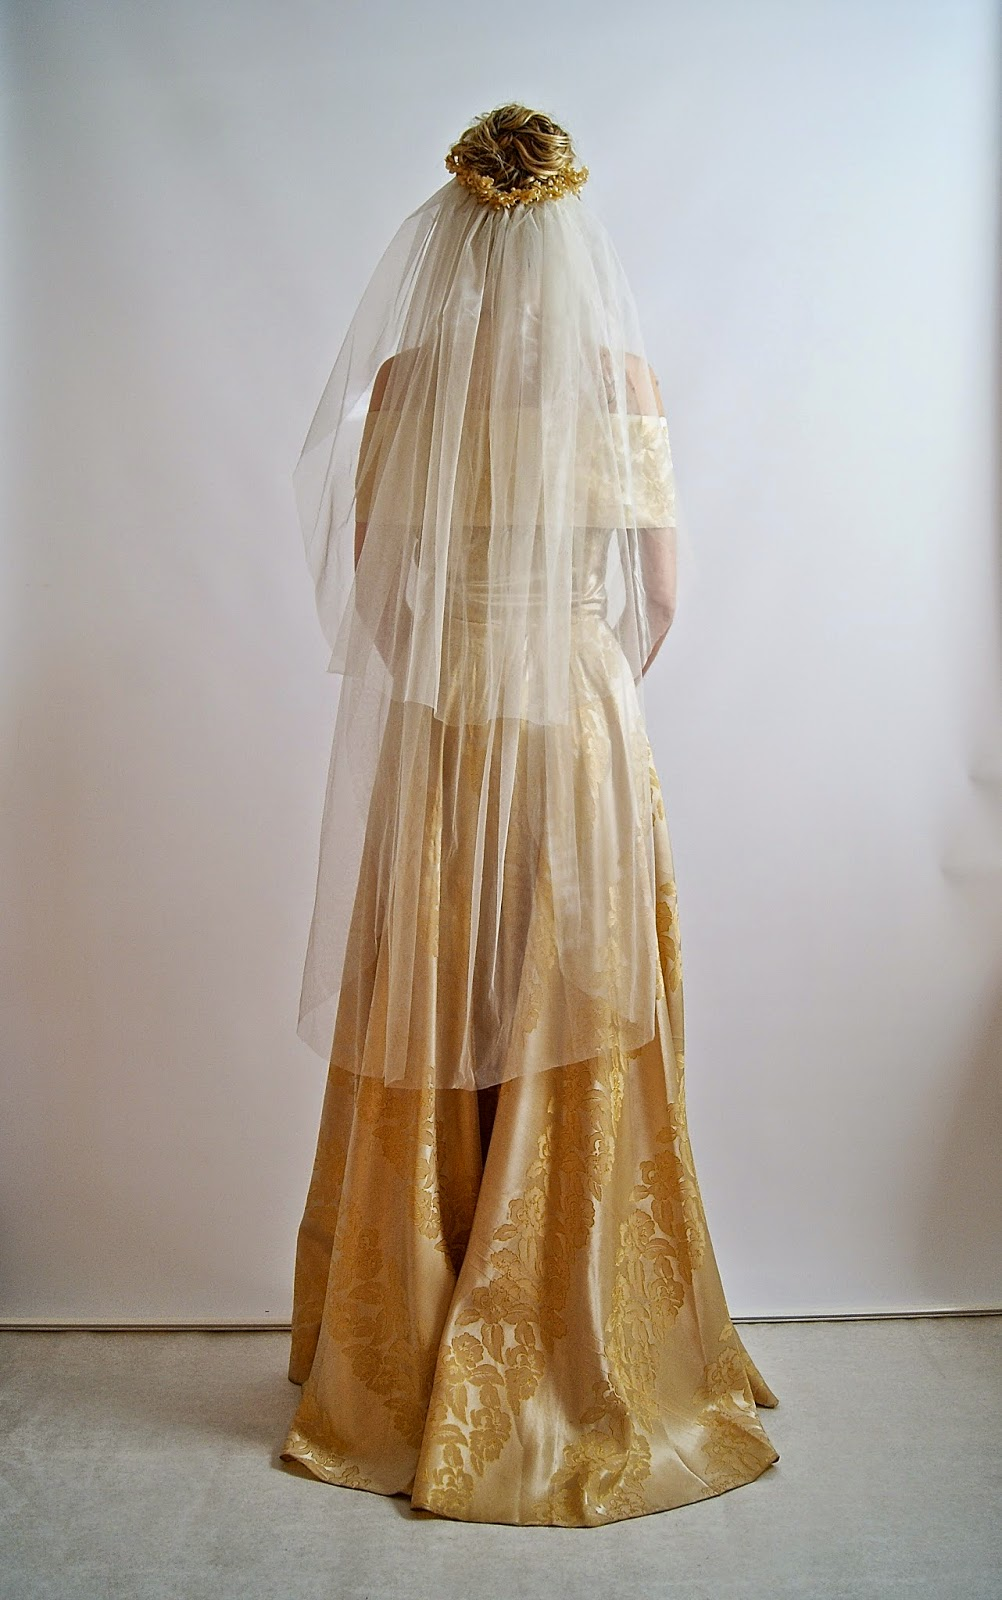 Affordable Wedding Dress Shops Portland Oregon - Wedding Guest Dresses